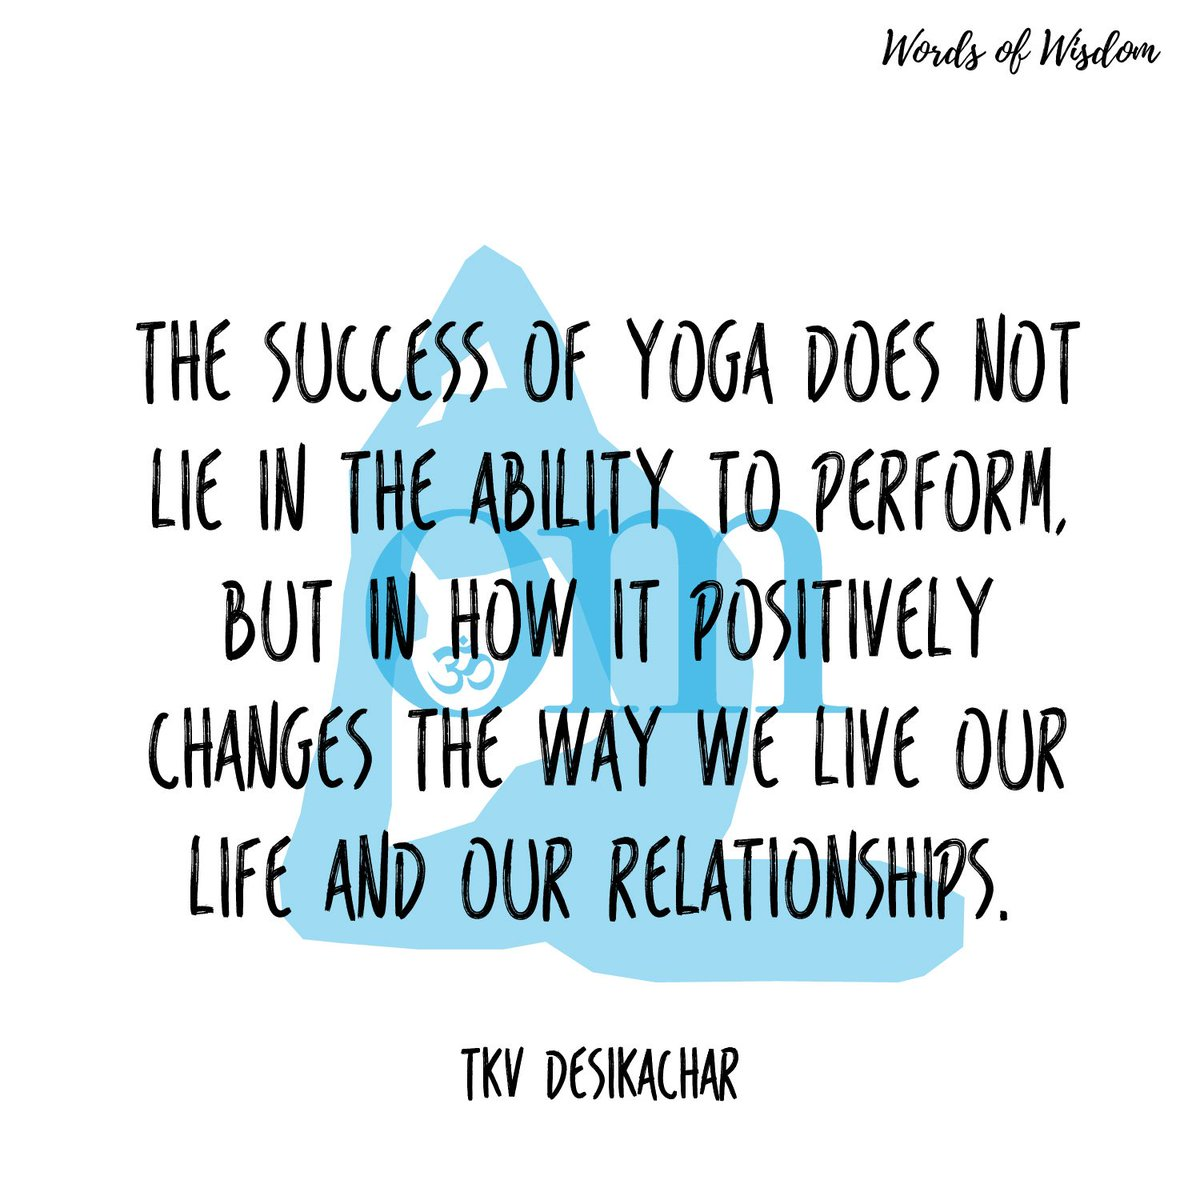 This month's Words of Wisdom, from TKV Desikachar. #omyogamagazine #omwordsofwisdom #tkvdesikachar